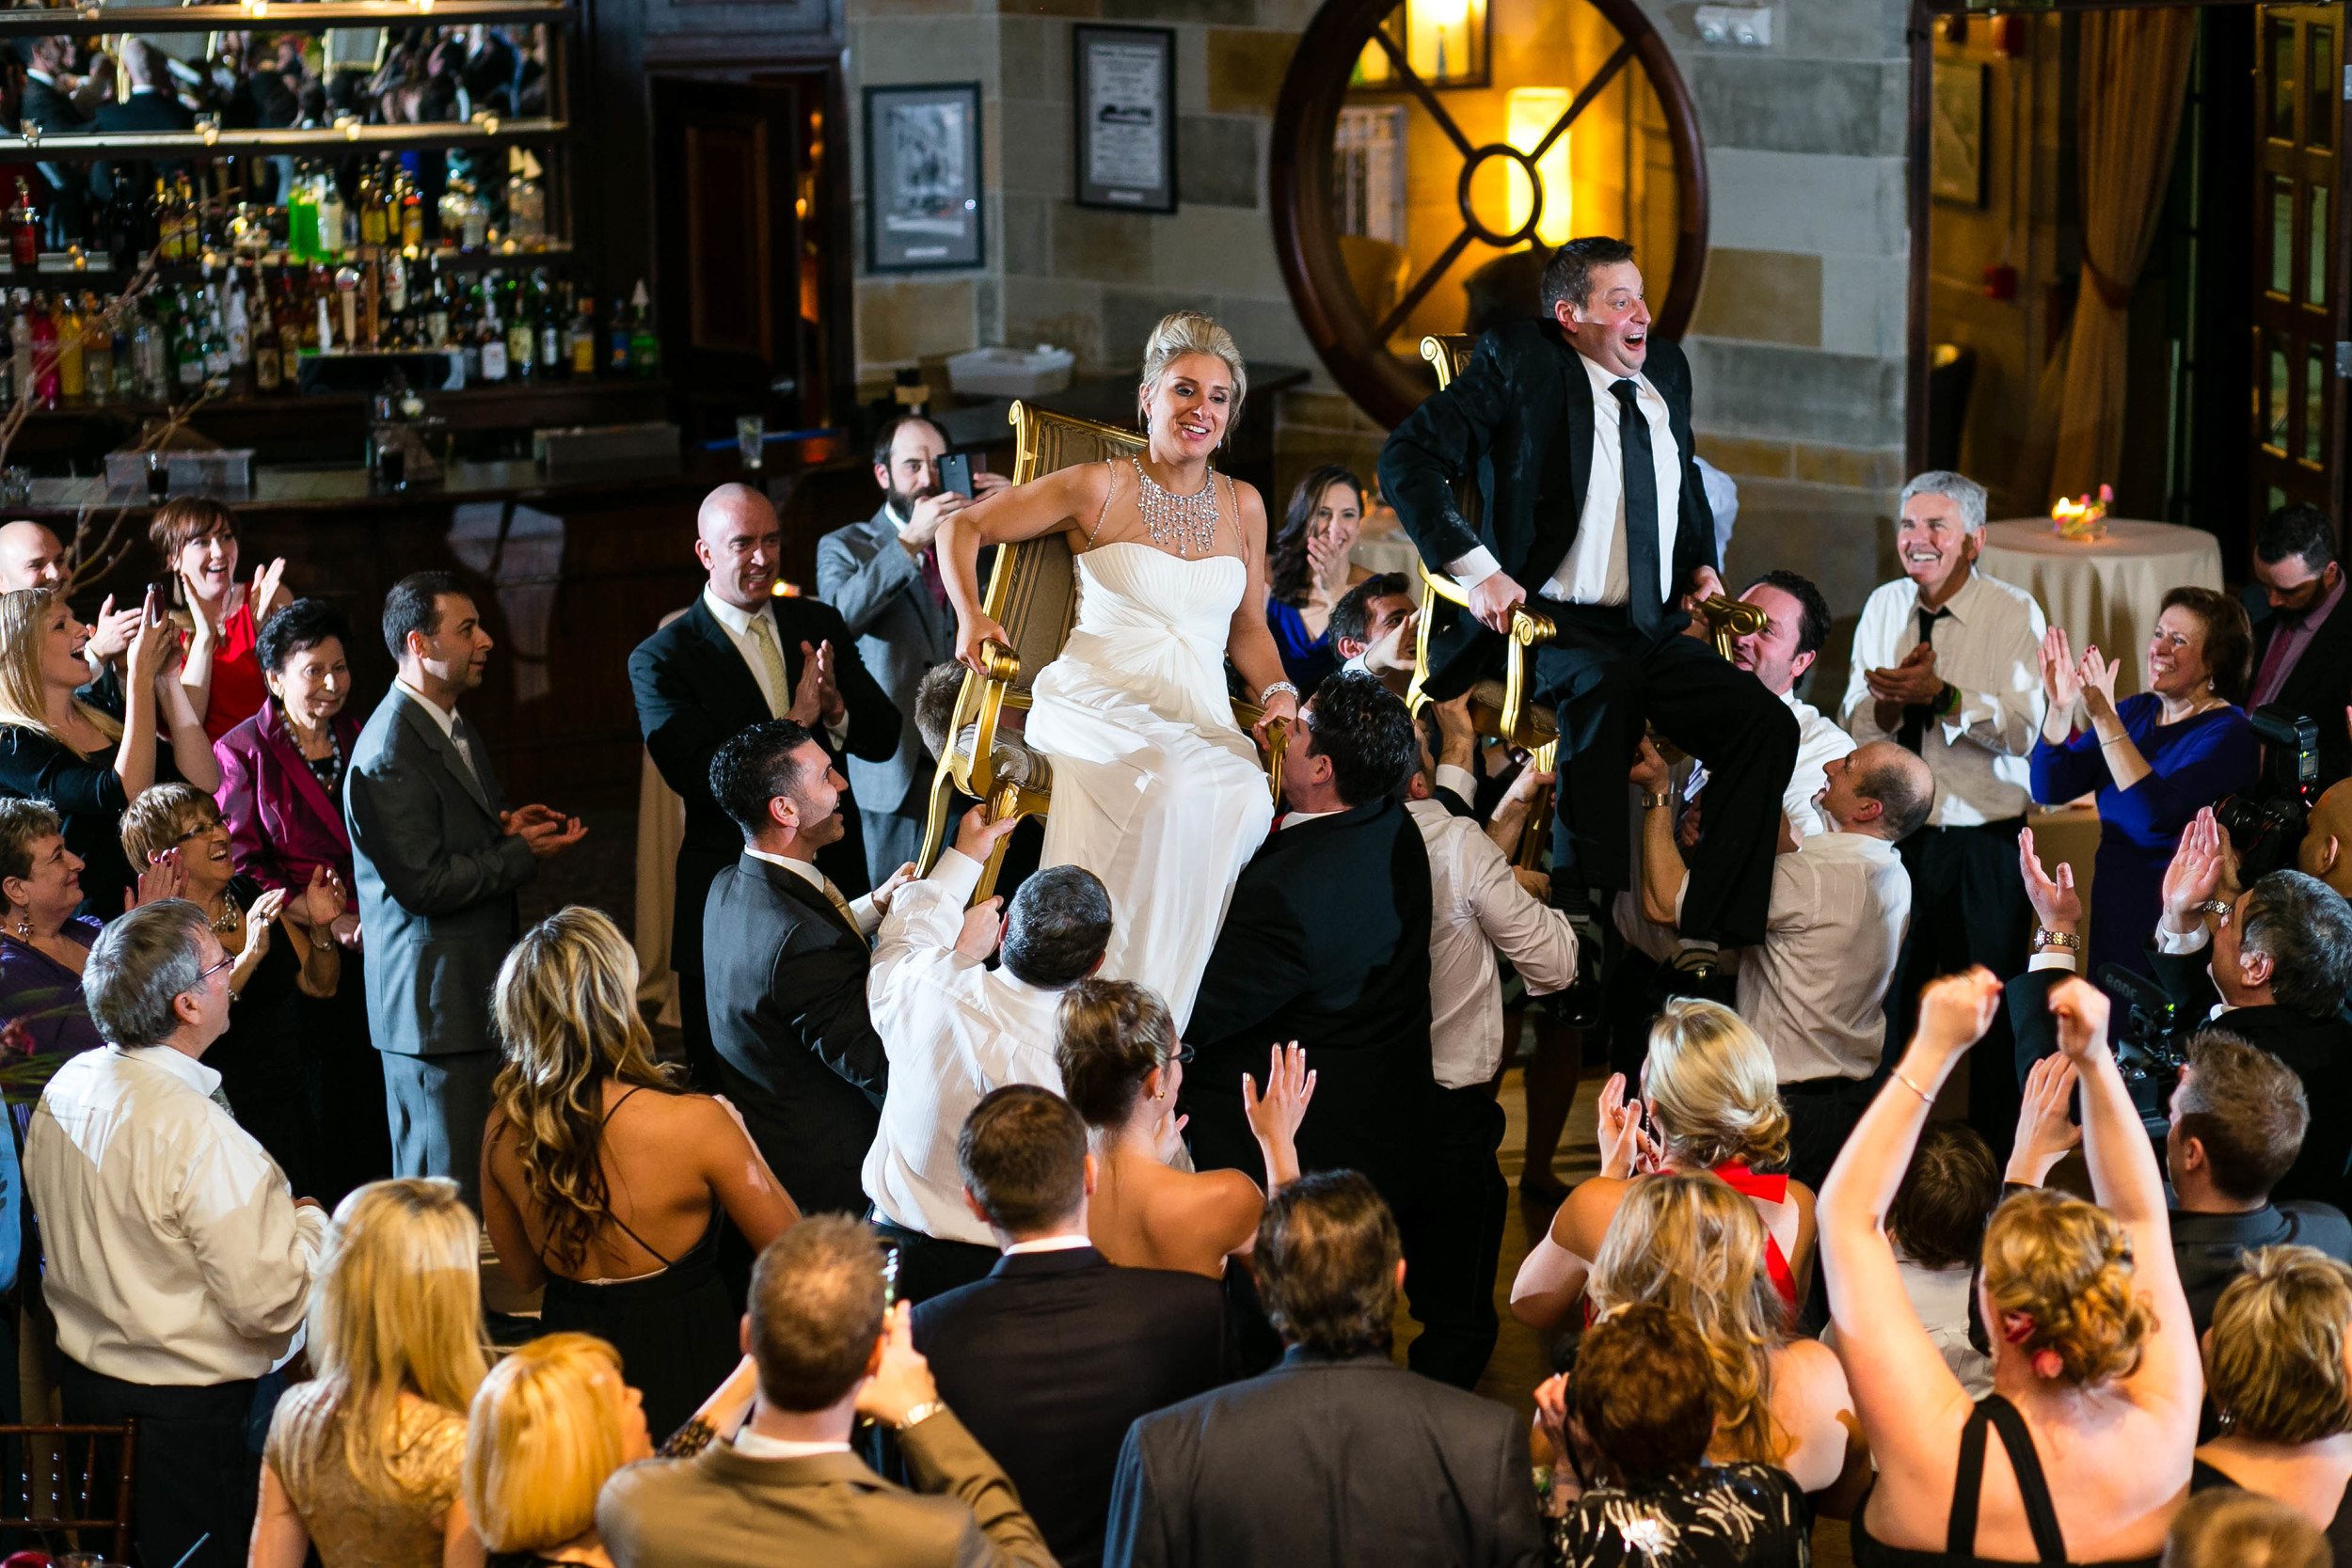 Jewish-Wedding-The-Society-Room-of-Hartford-Connecticut-Documentary-Wedding-Photography-Jacek-Dolata-7.jpg